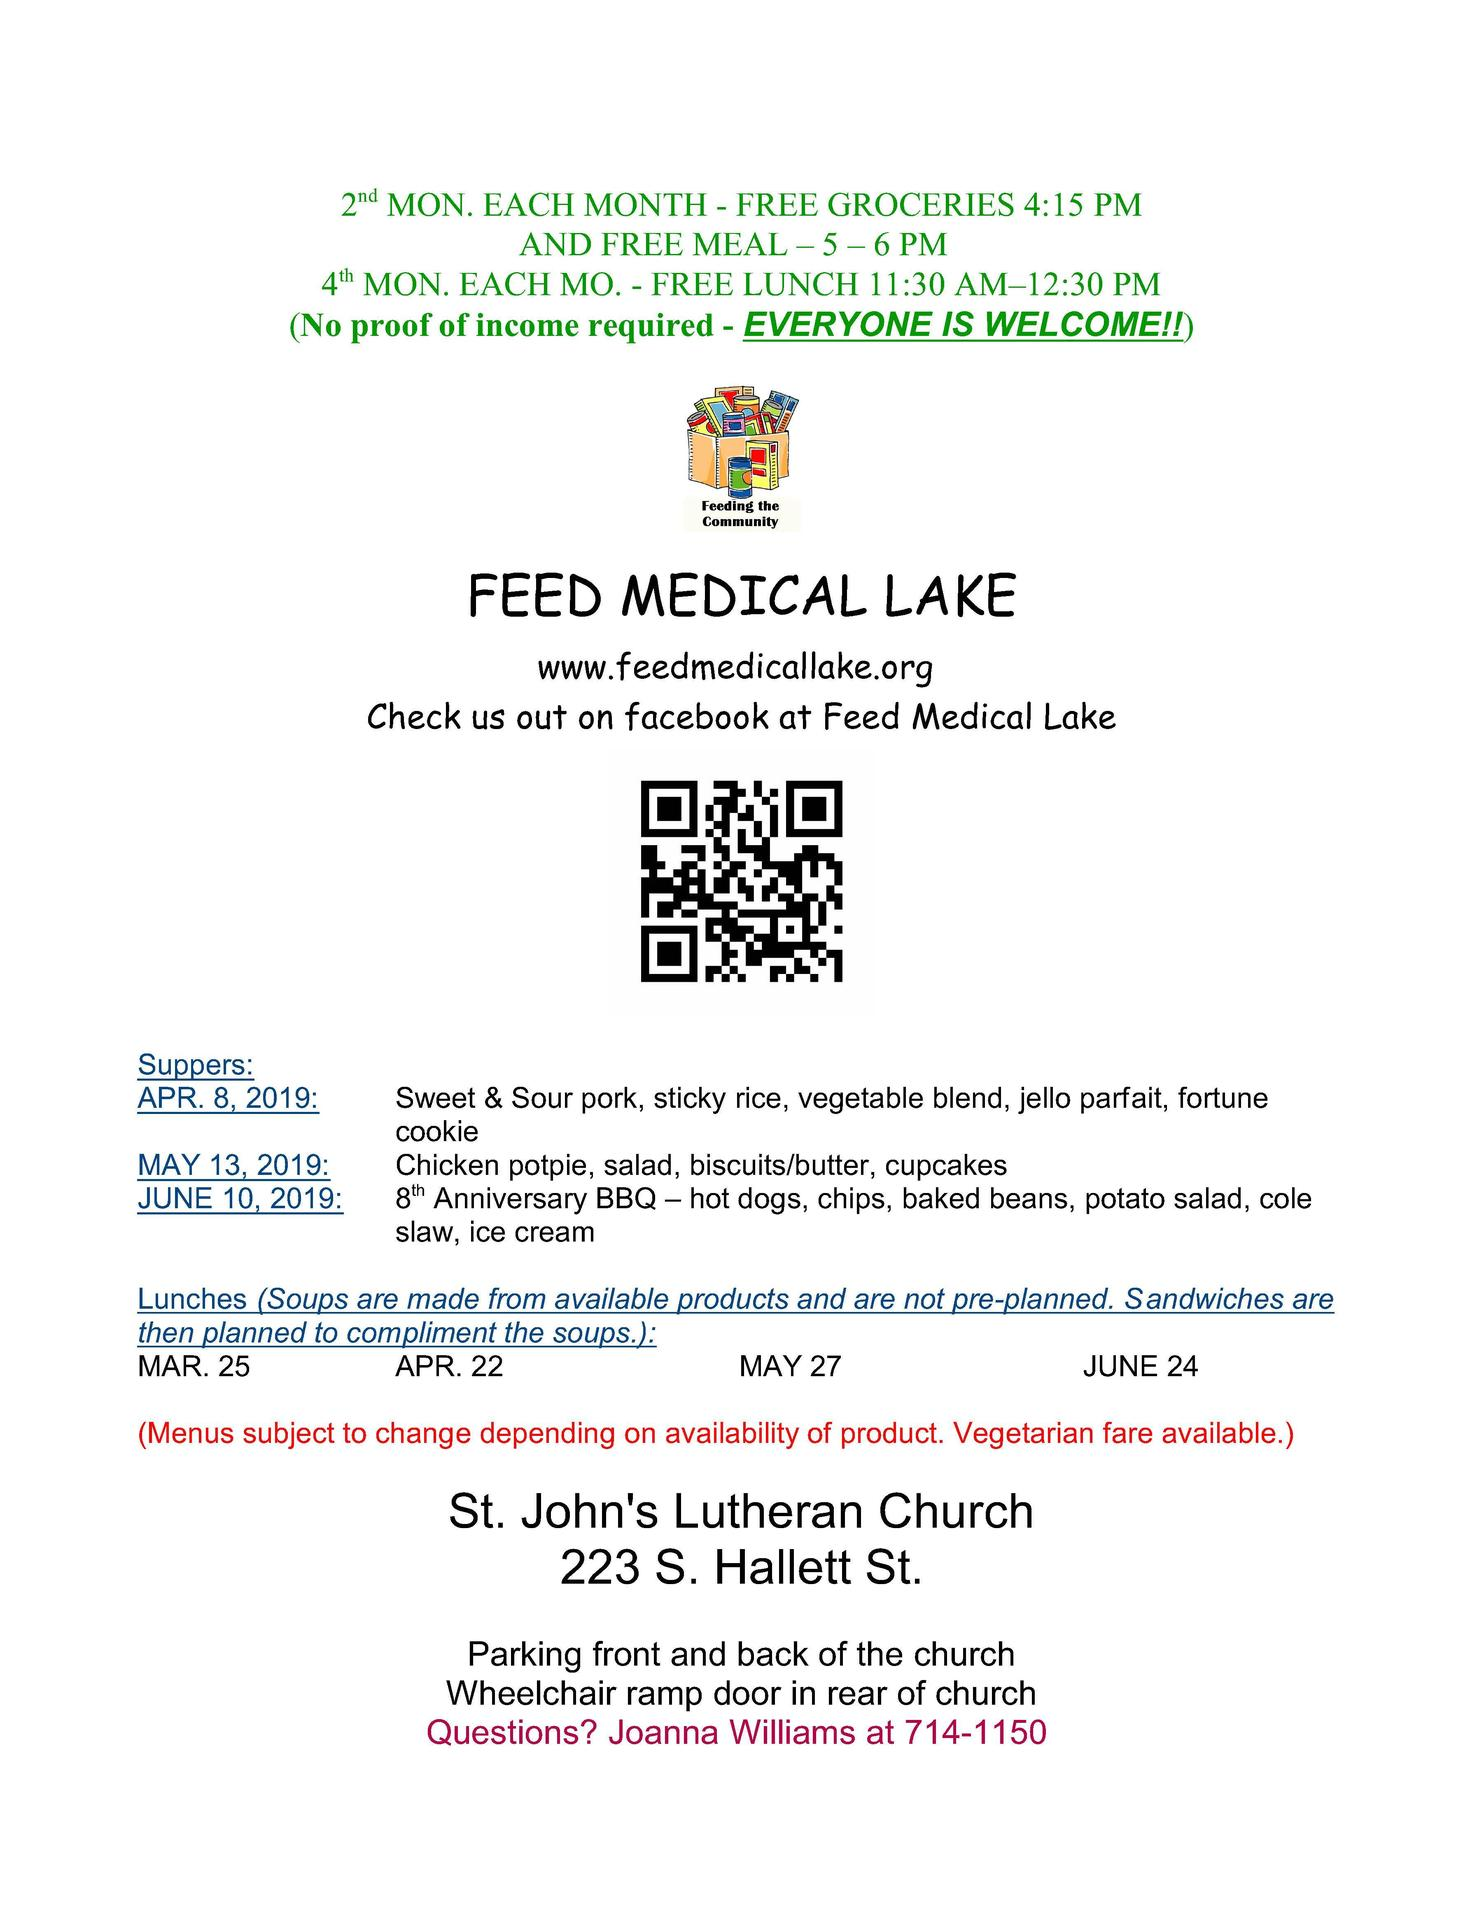 Feed Medical Lake Flyer April 8 through June 11